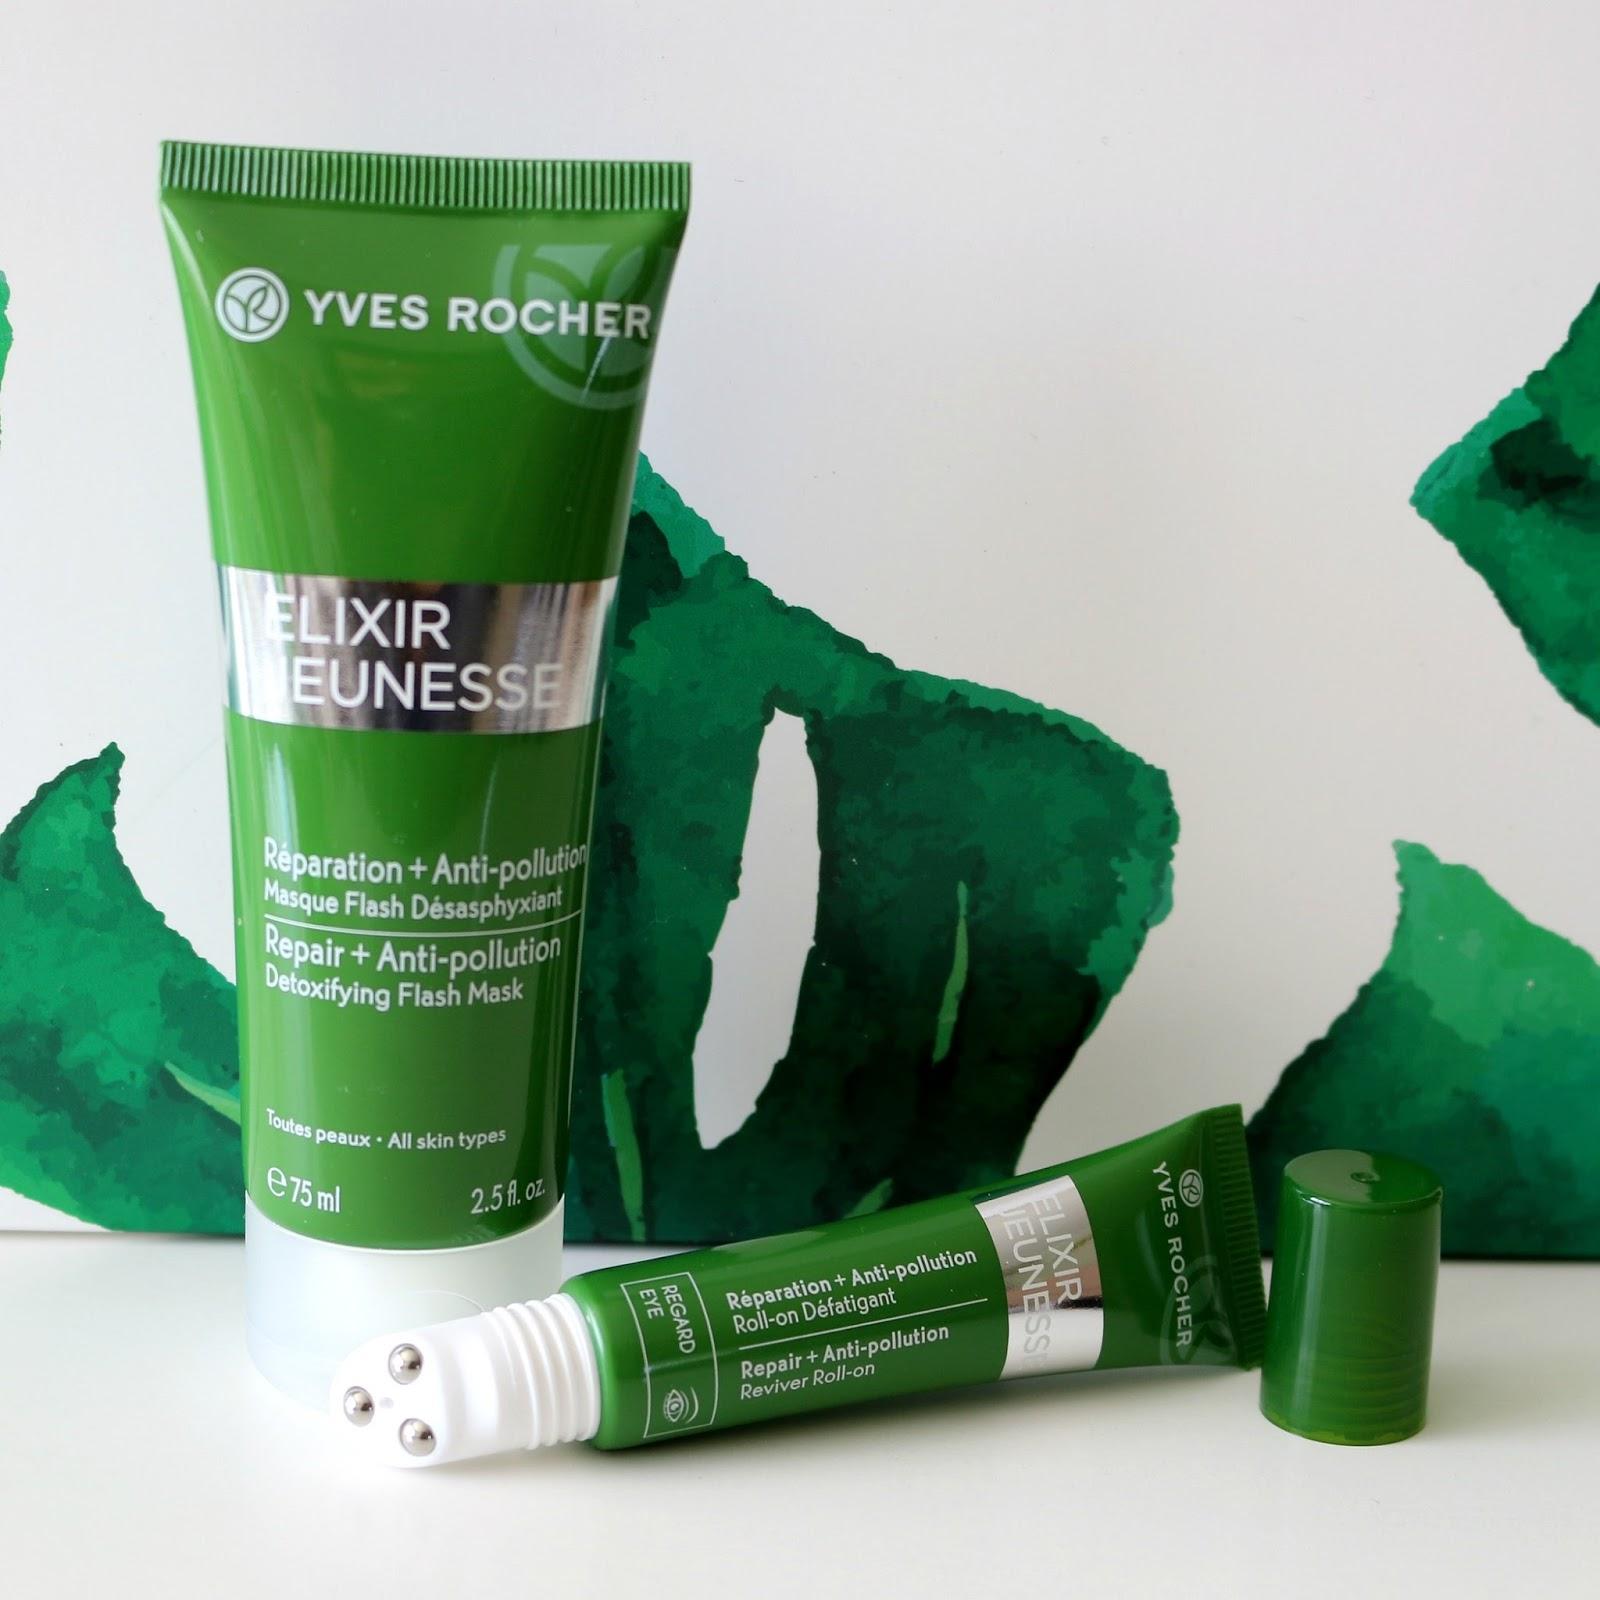 yves rocher elixir jeunesse repair anti-pollution detoxifying flash mask reviver roll-on